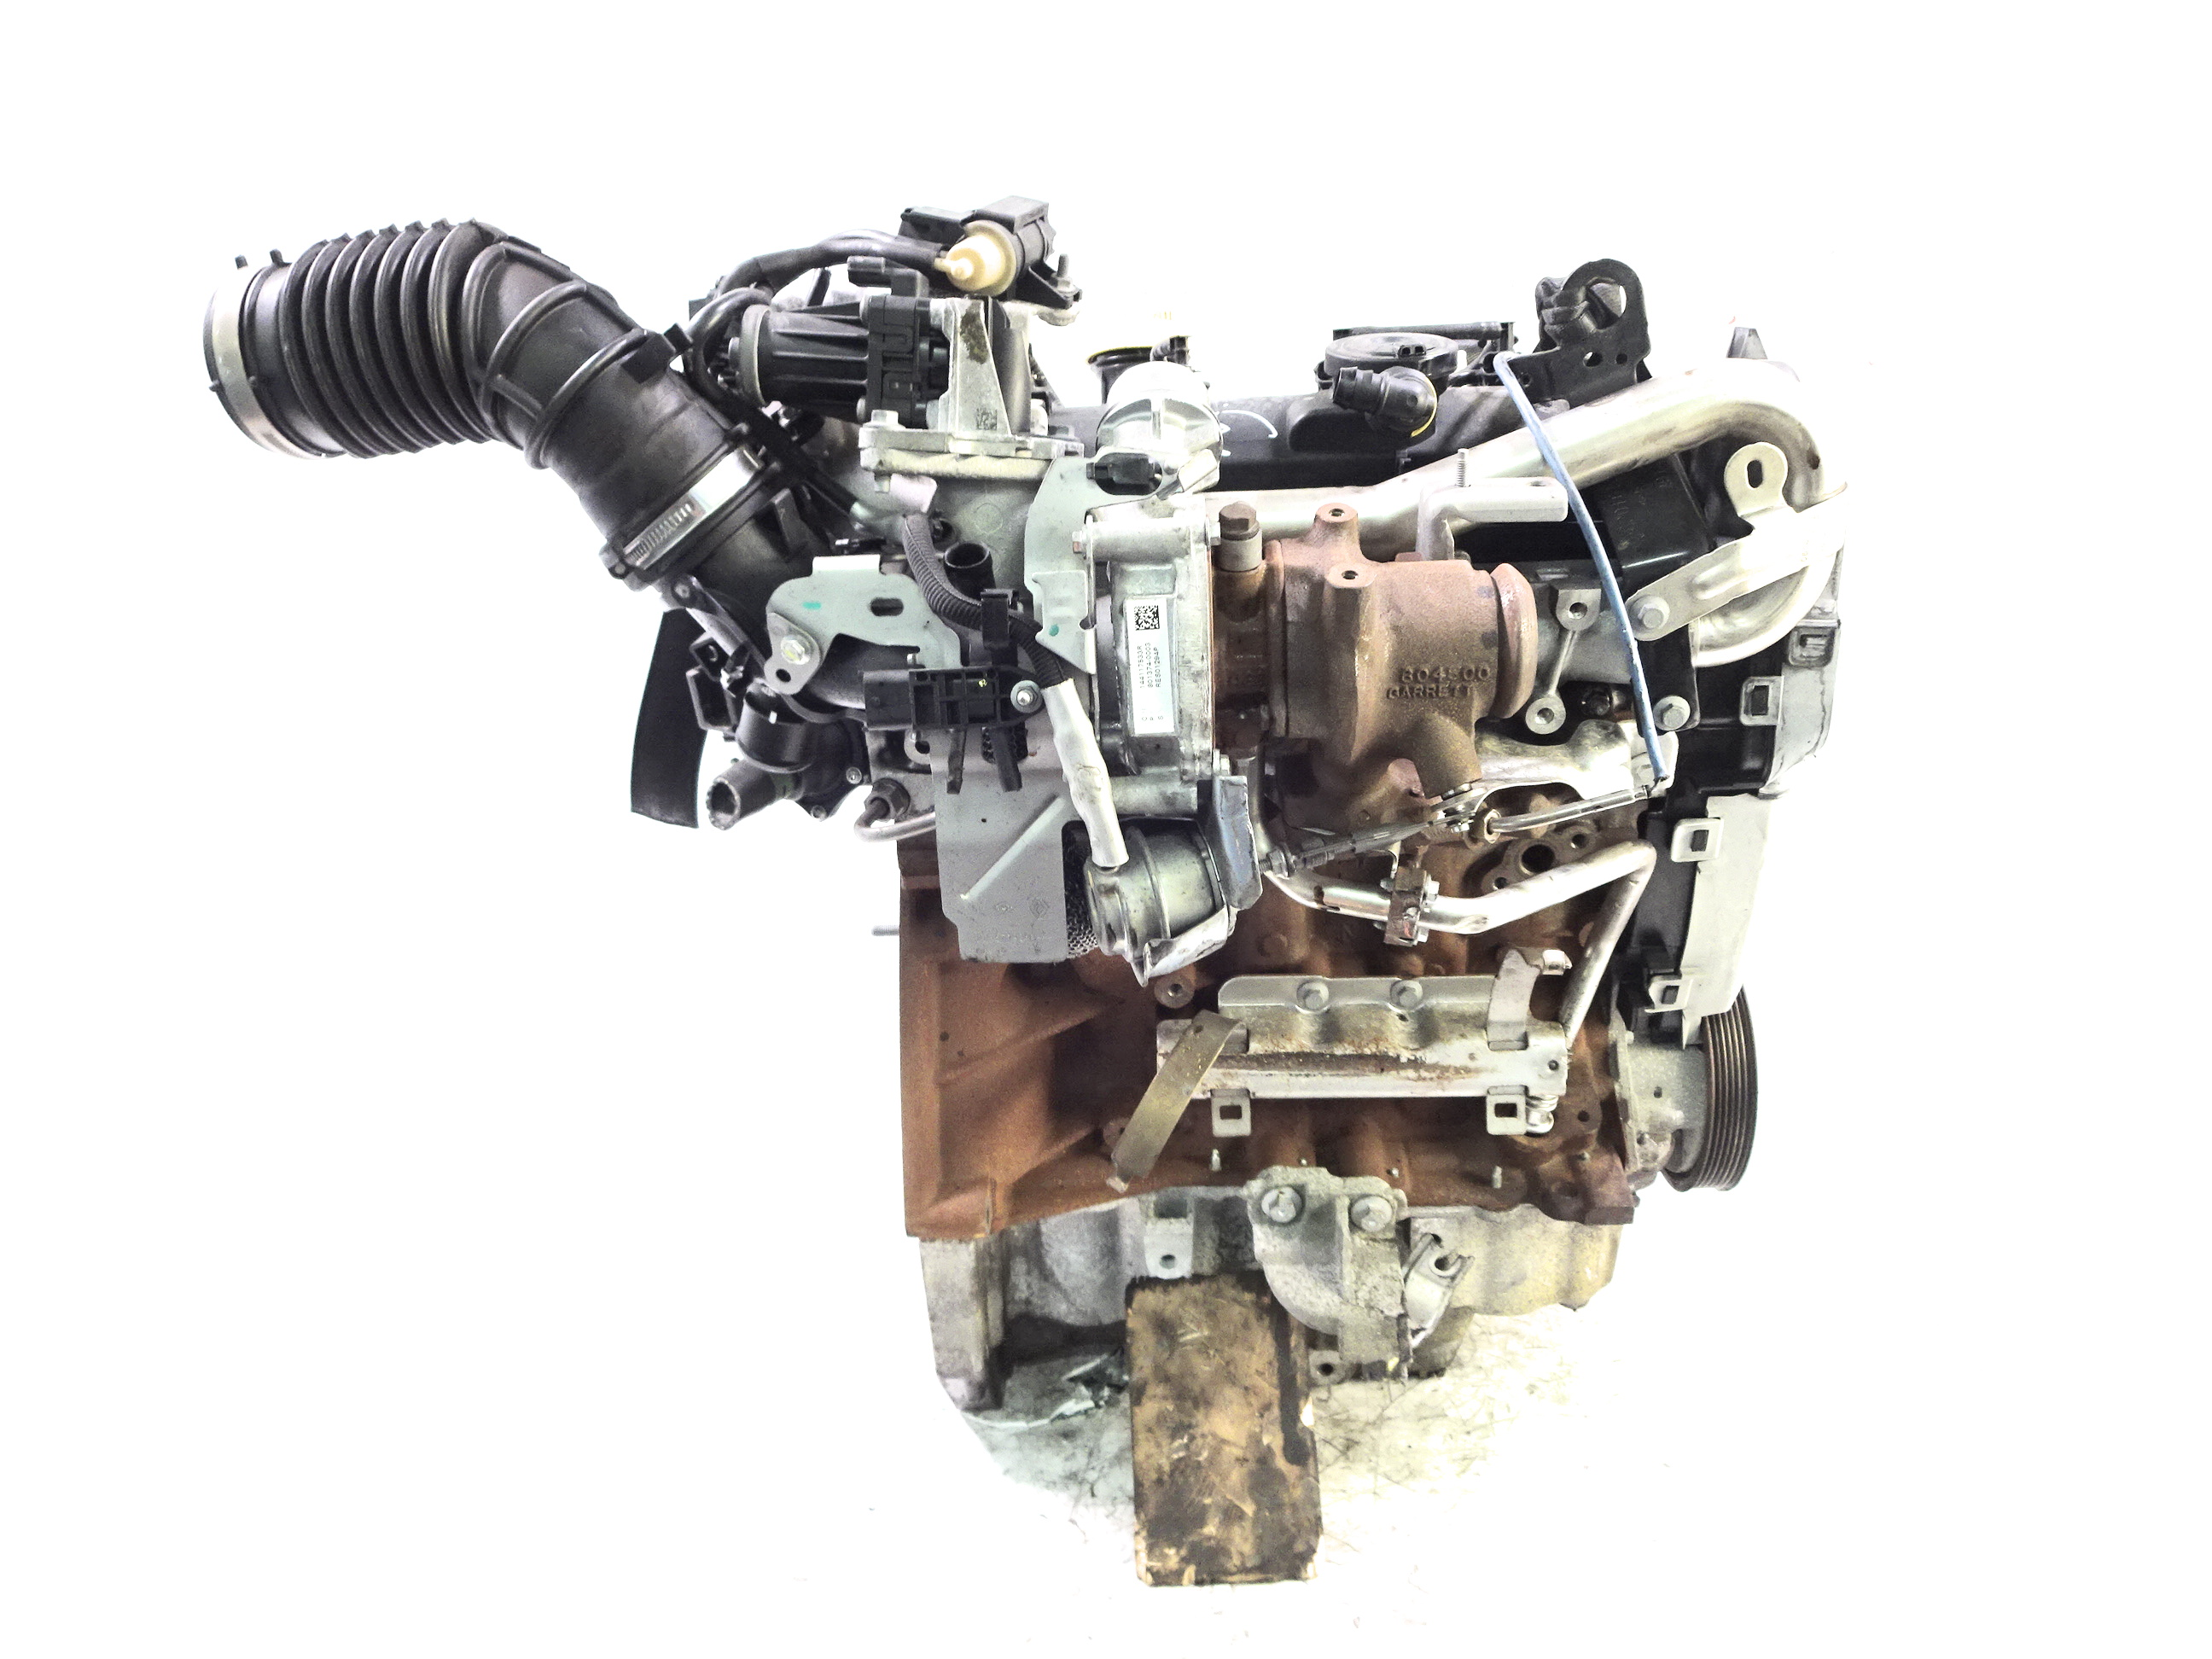 Motor 2014 Renault Captur 1,5 dCi Diesel K9K K9K608 90 PS mit Anbauteilen